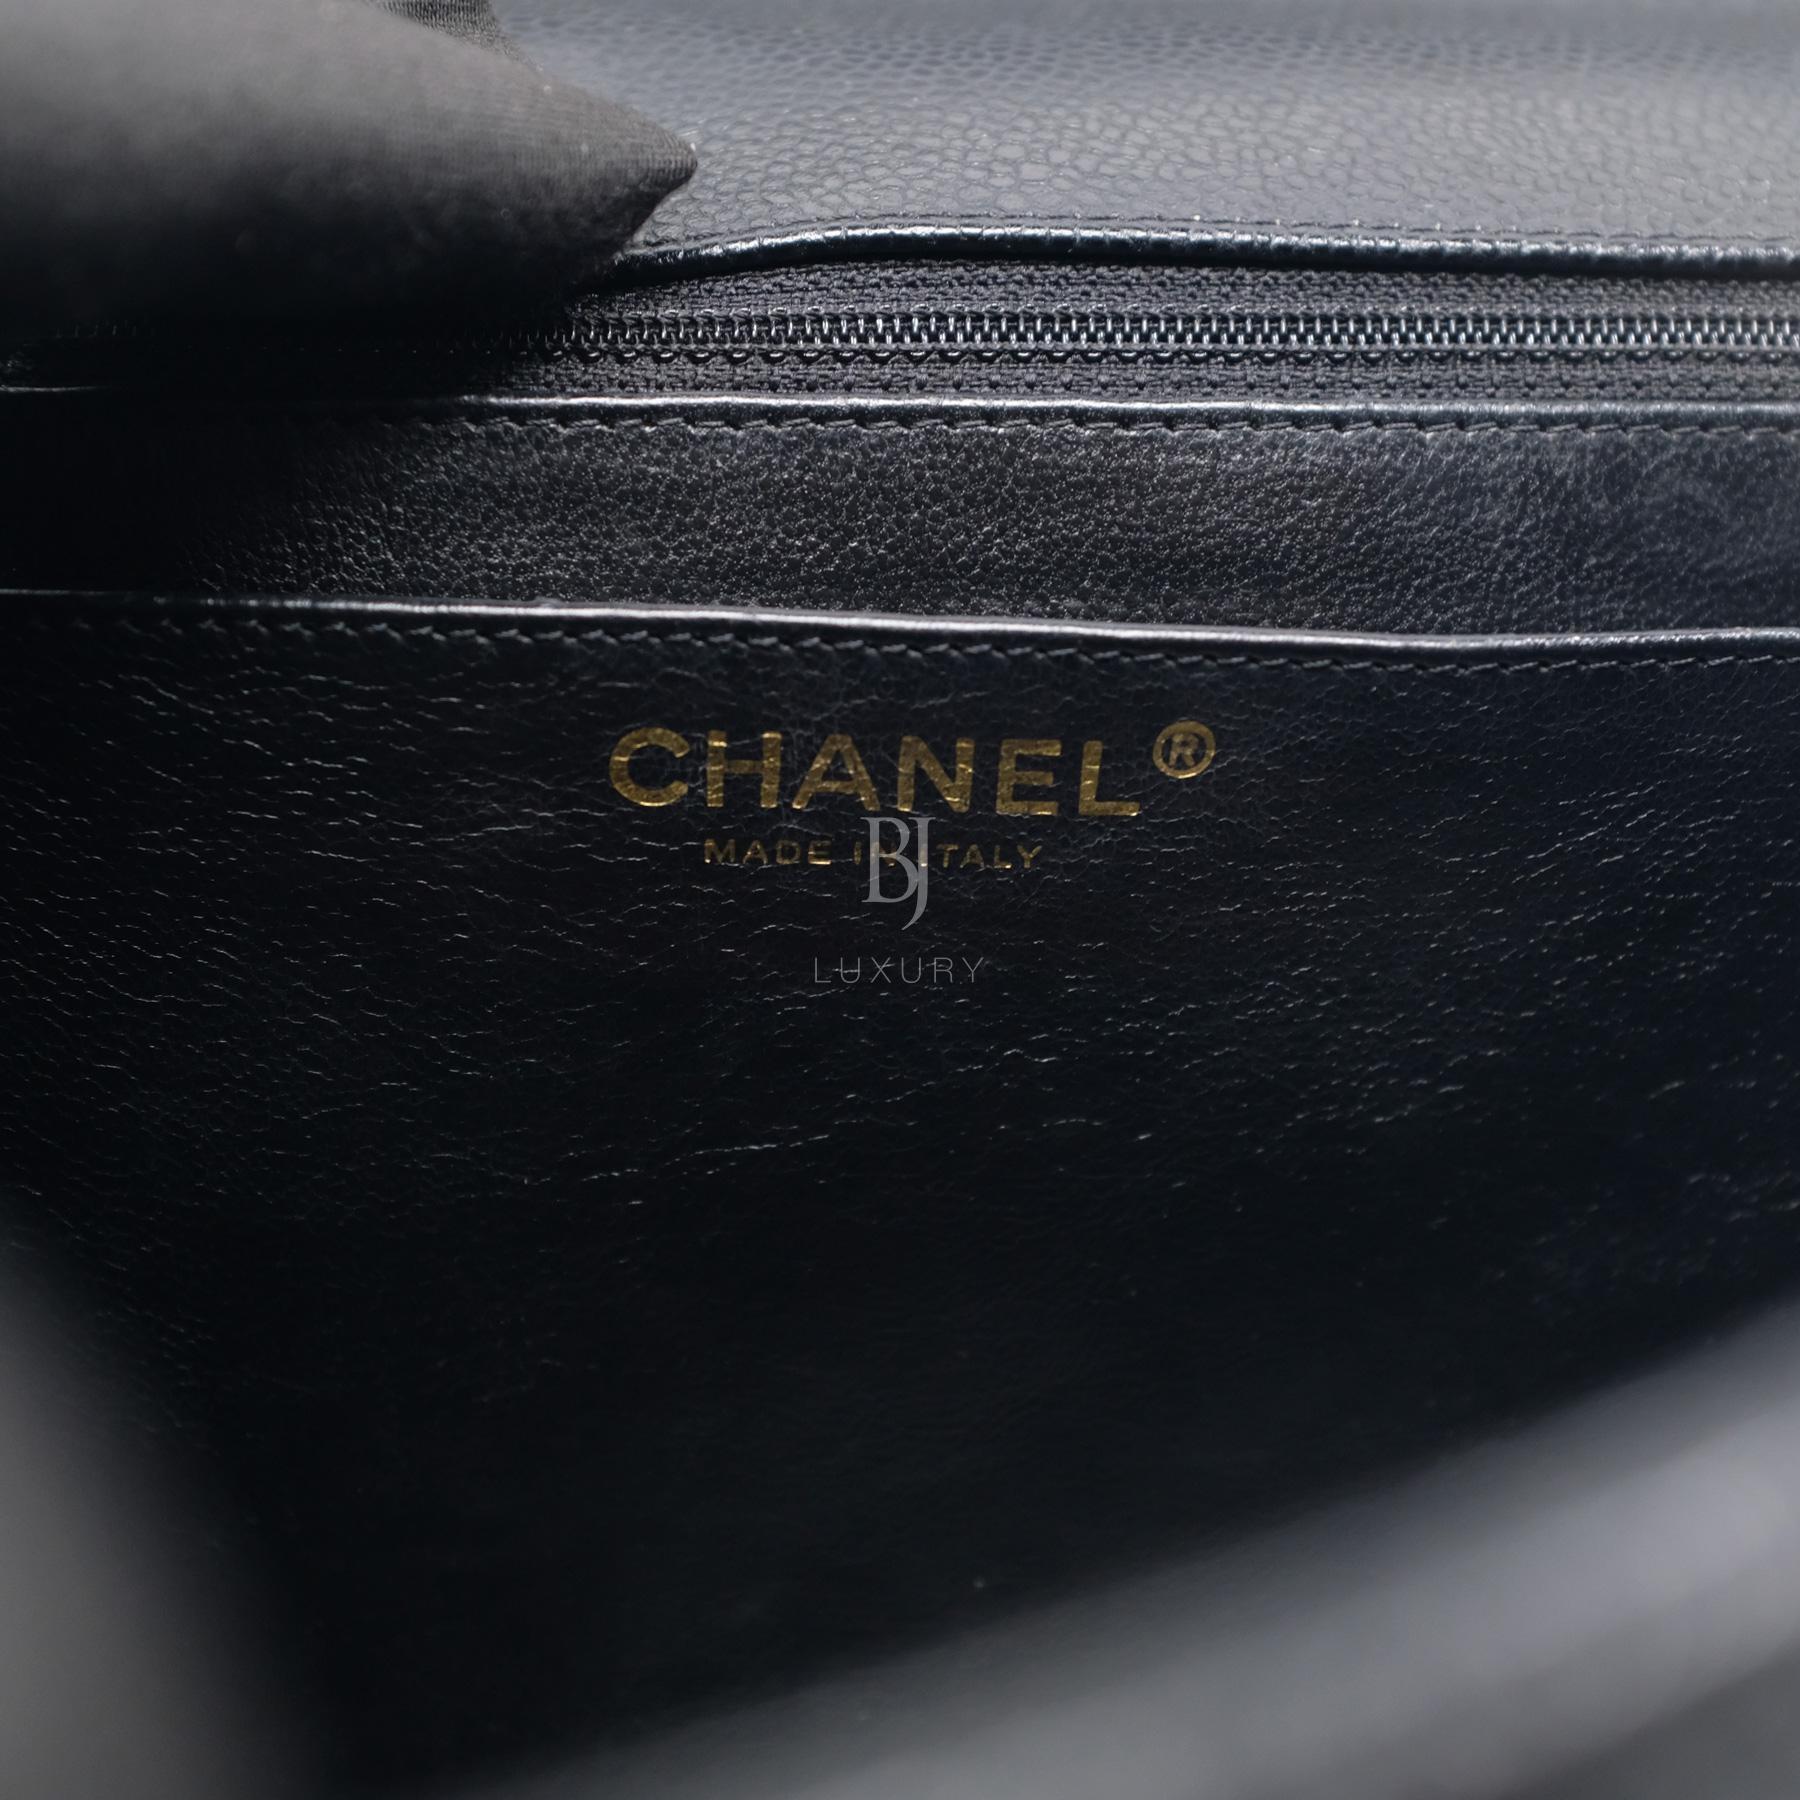 CHANEL-FLAPBAG-MAXI-BLACK-CAVIAR-DSCF8066.jpg